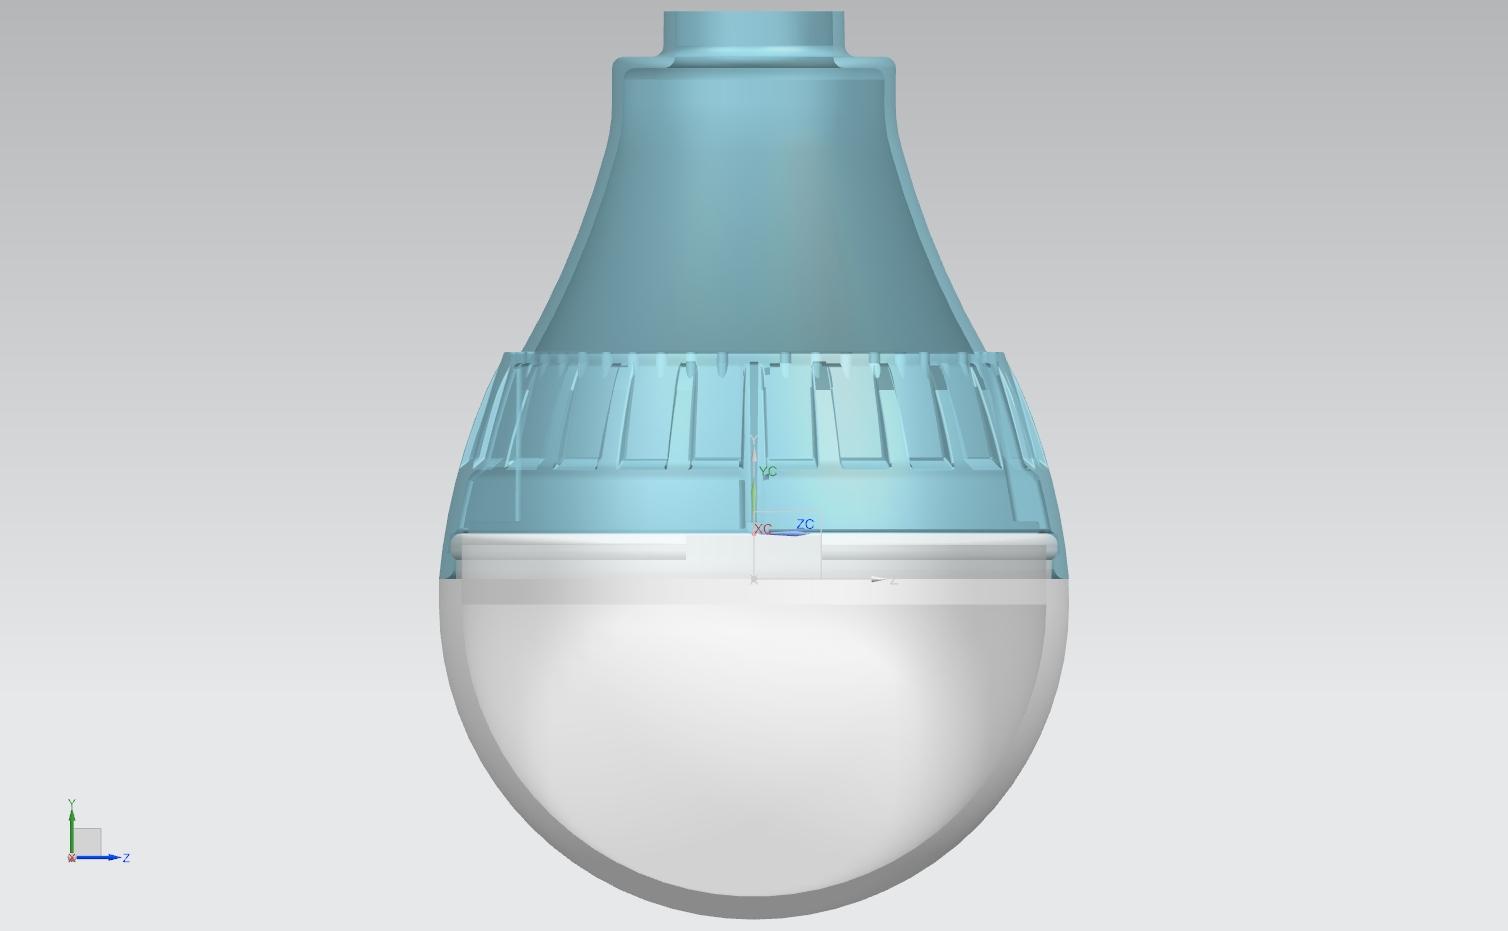 anchorage alalska new invention caranchorage alaska inventors forumgripper invention designlight bul